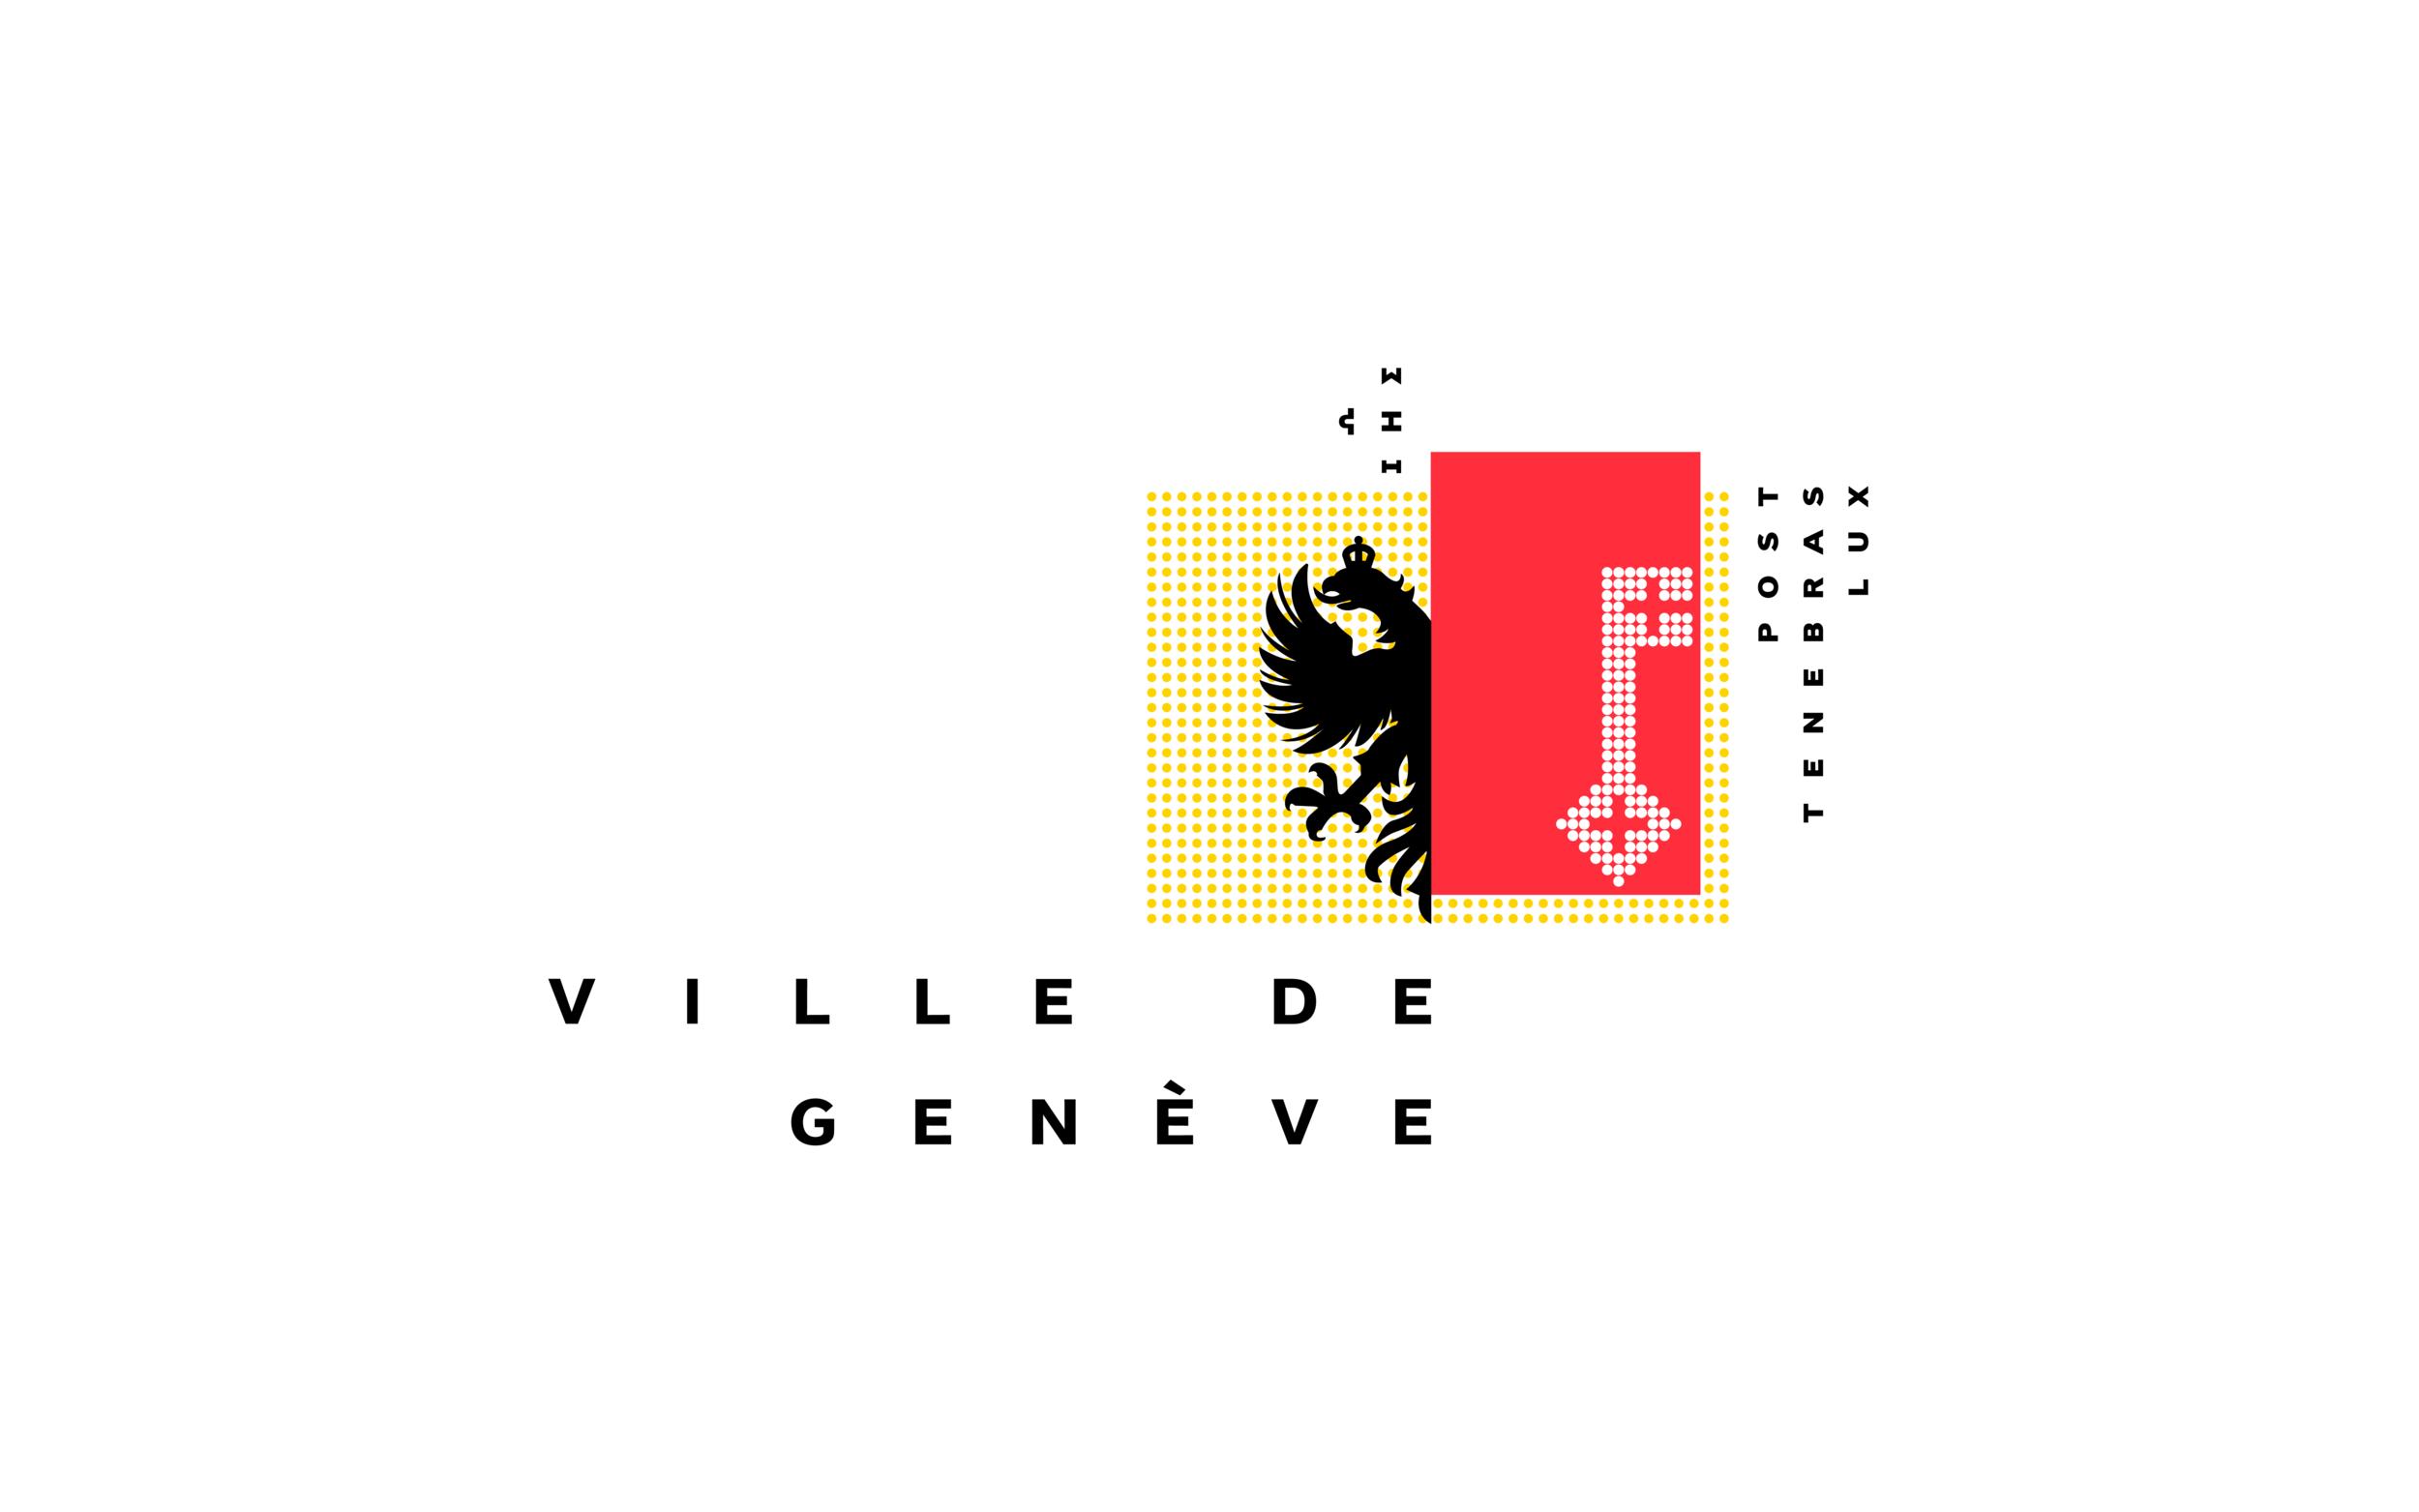 ville_geneve.png